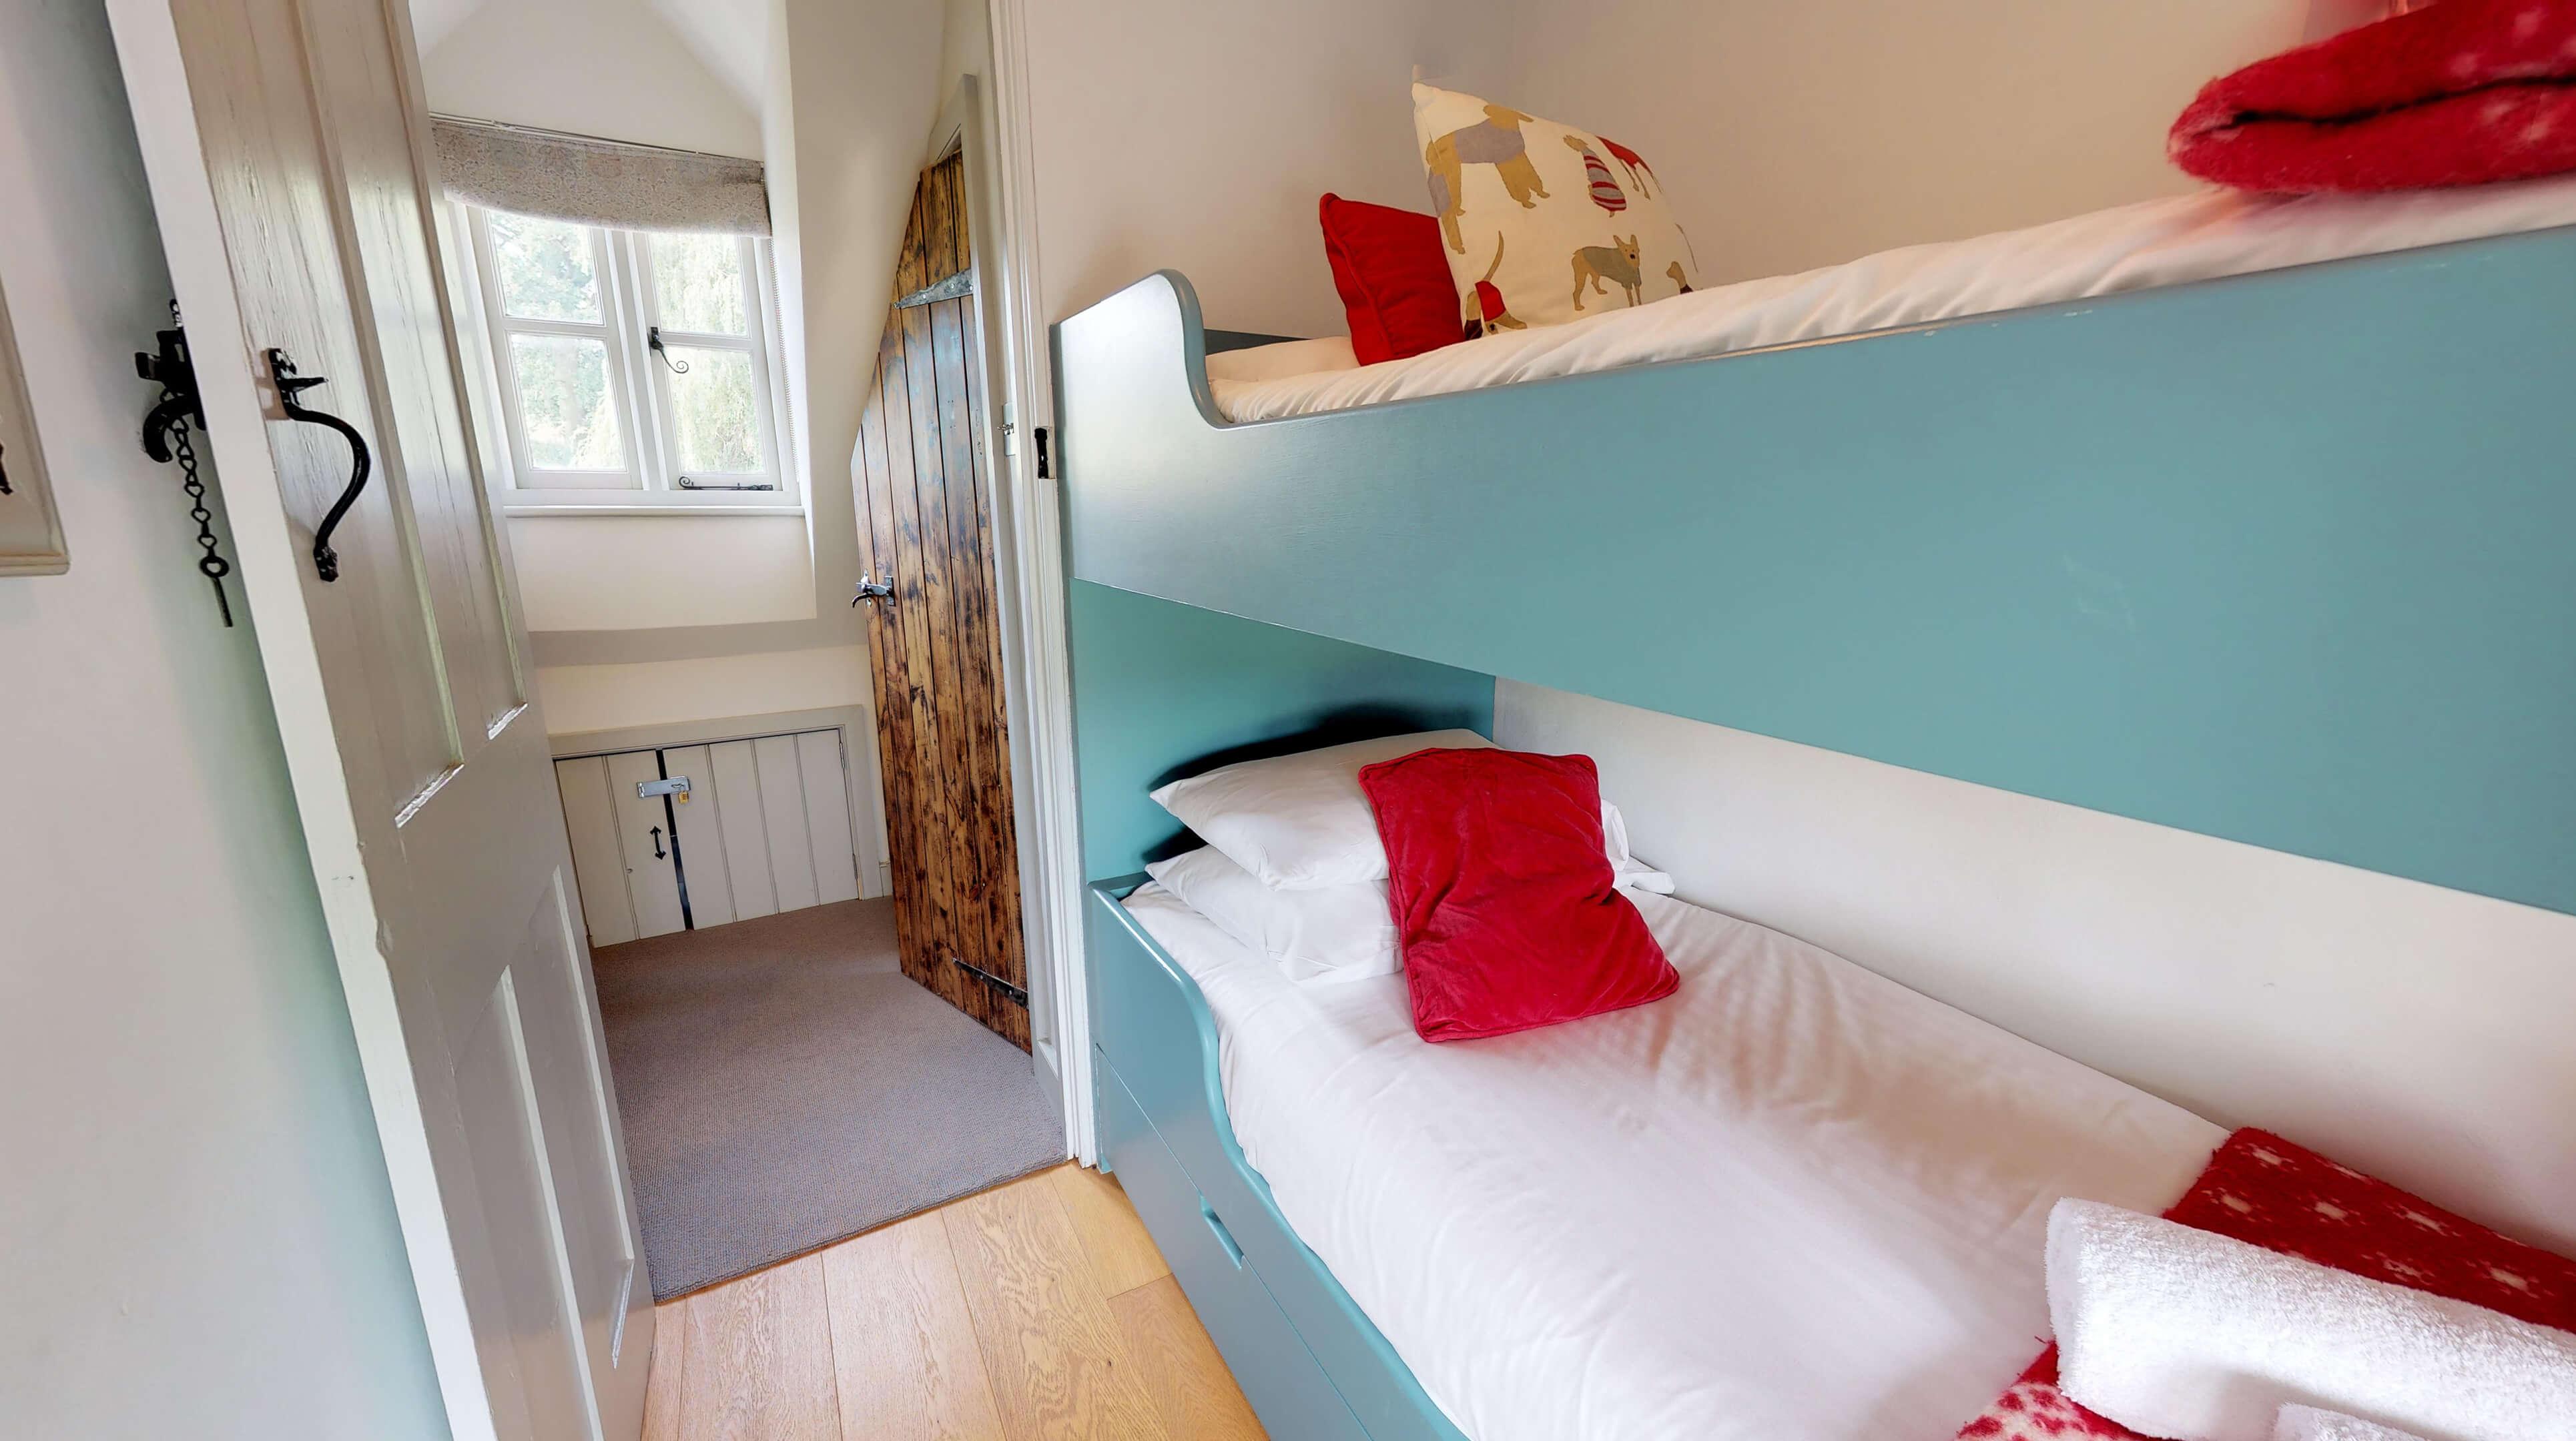 Lower Heyford Three Bedroom Coopers Cottage Bedroom Three 1